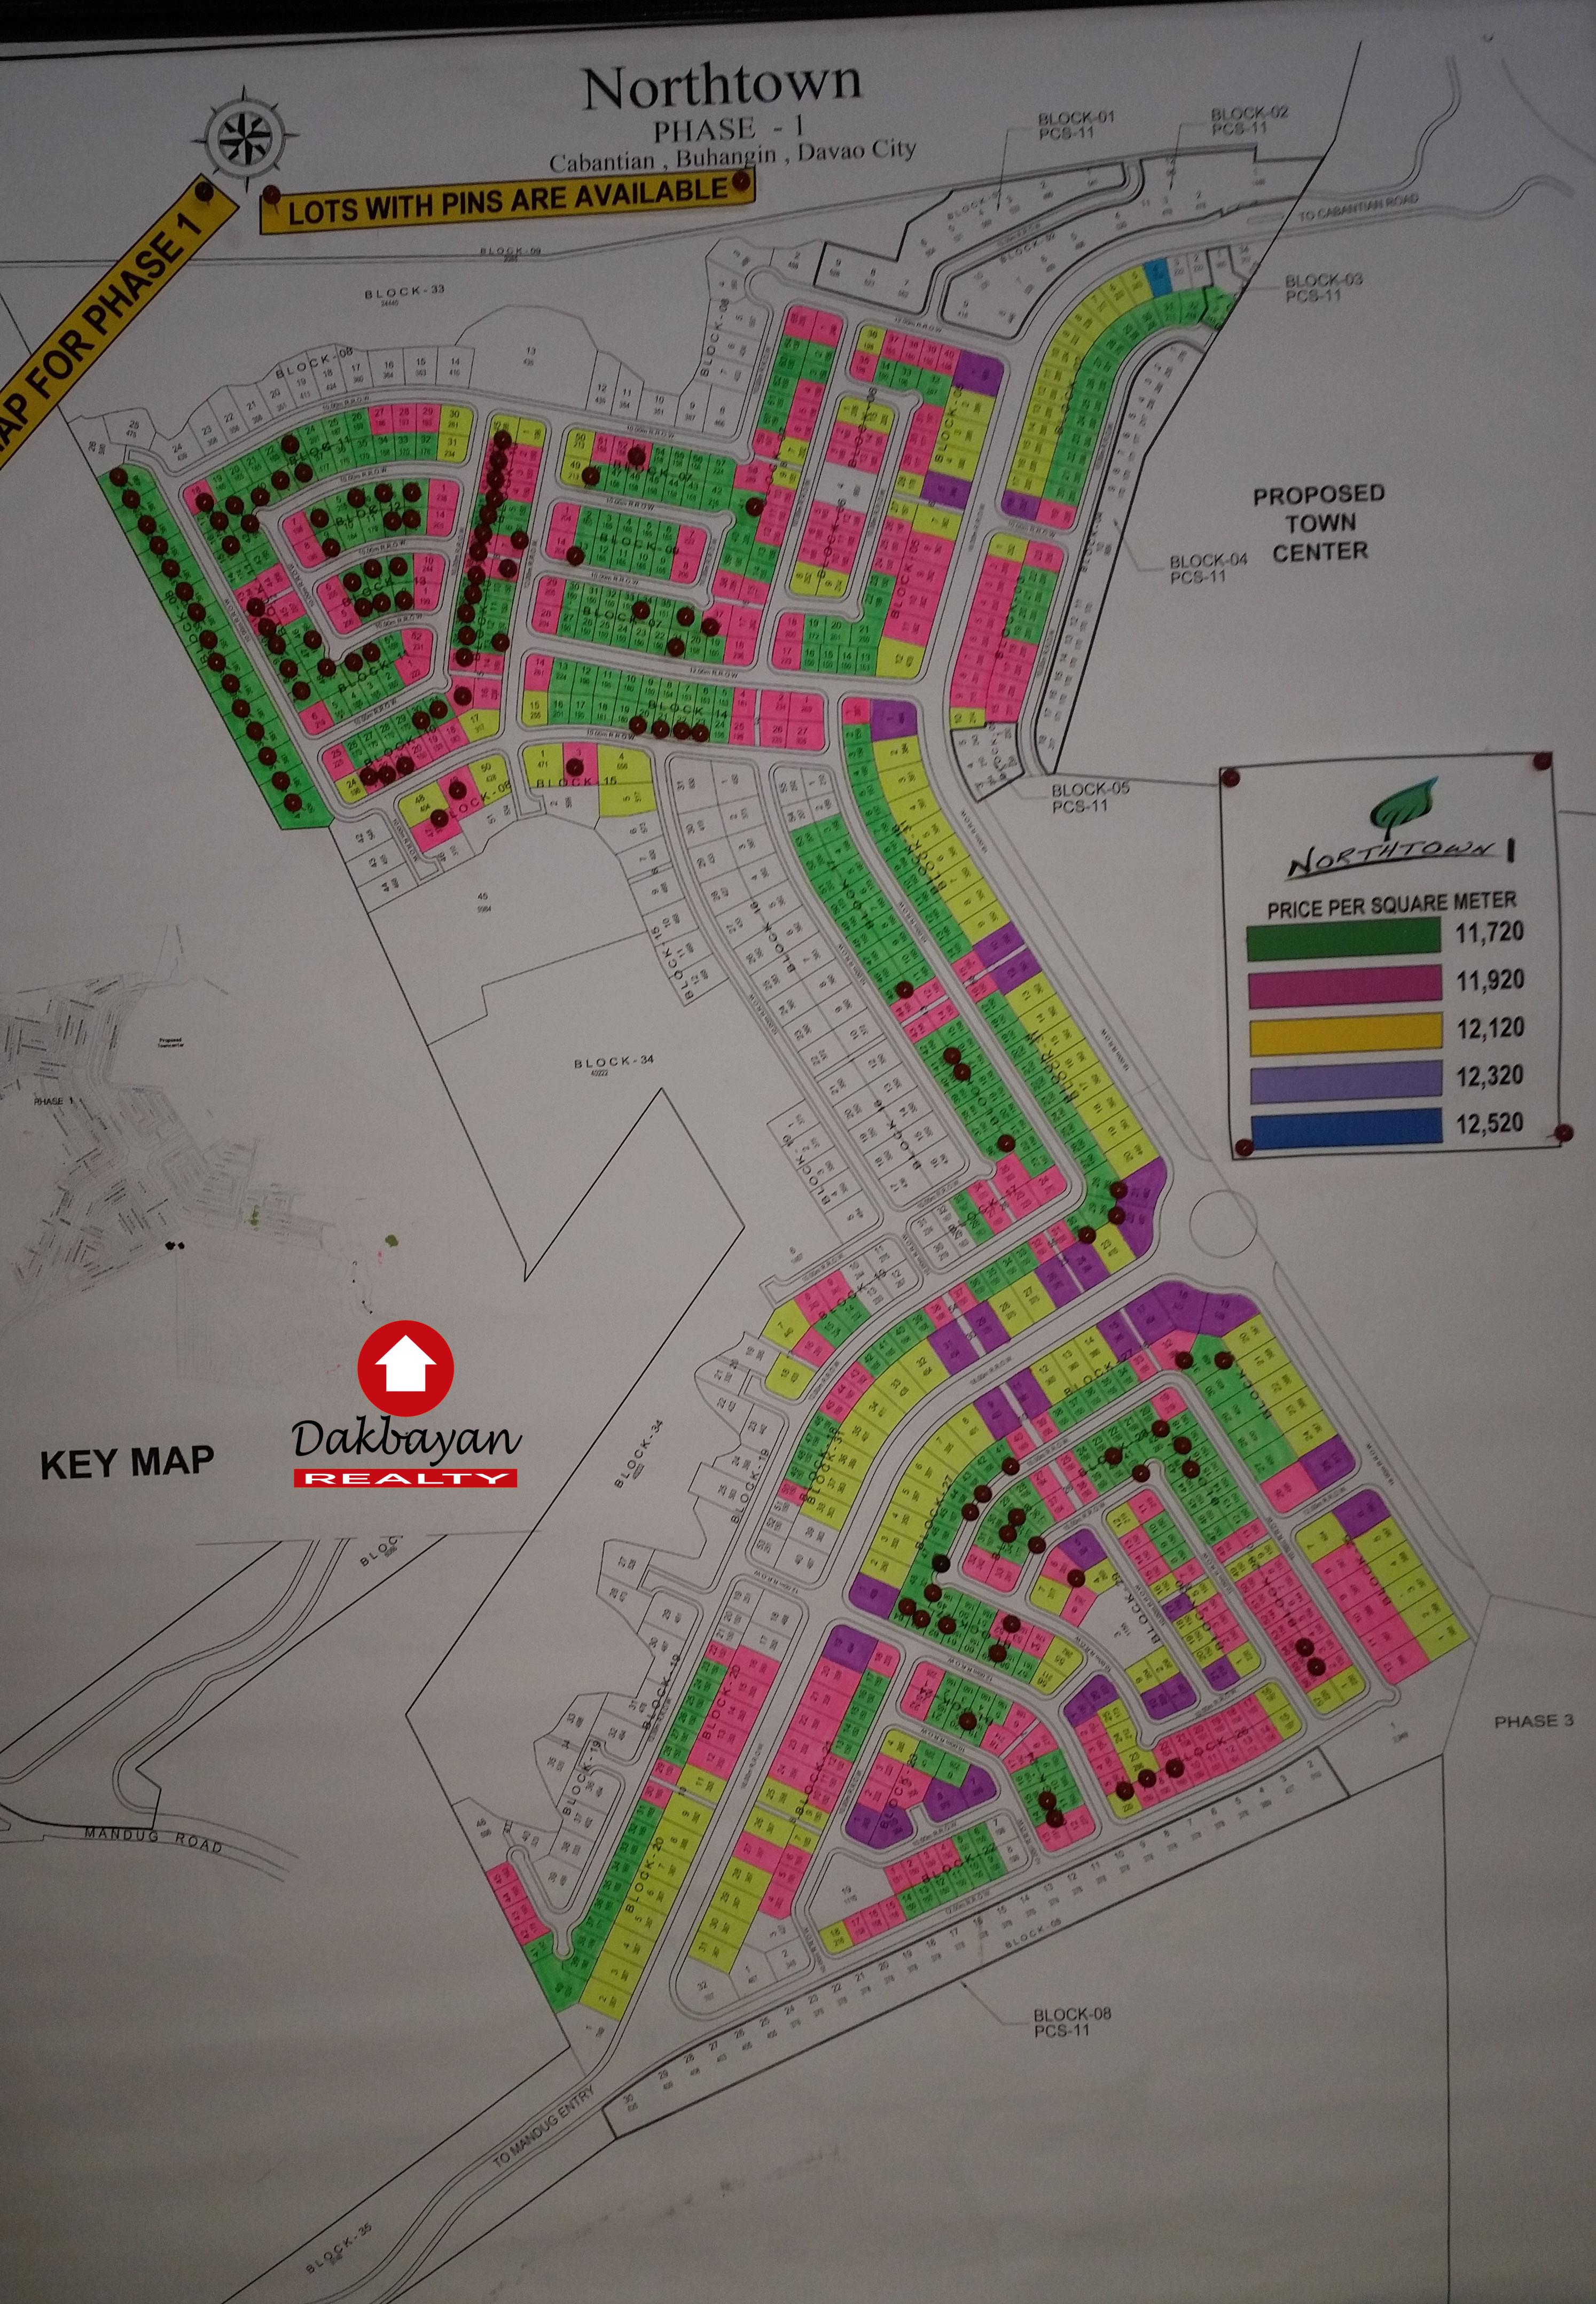 Site development map of Northtown